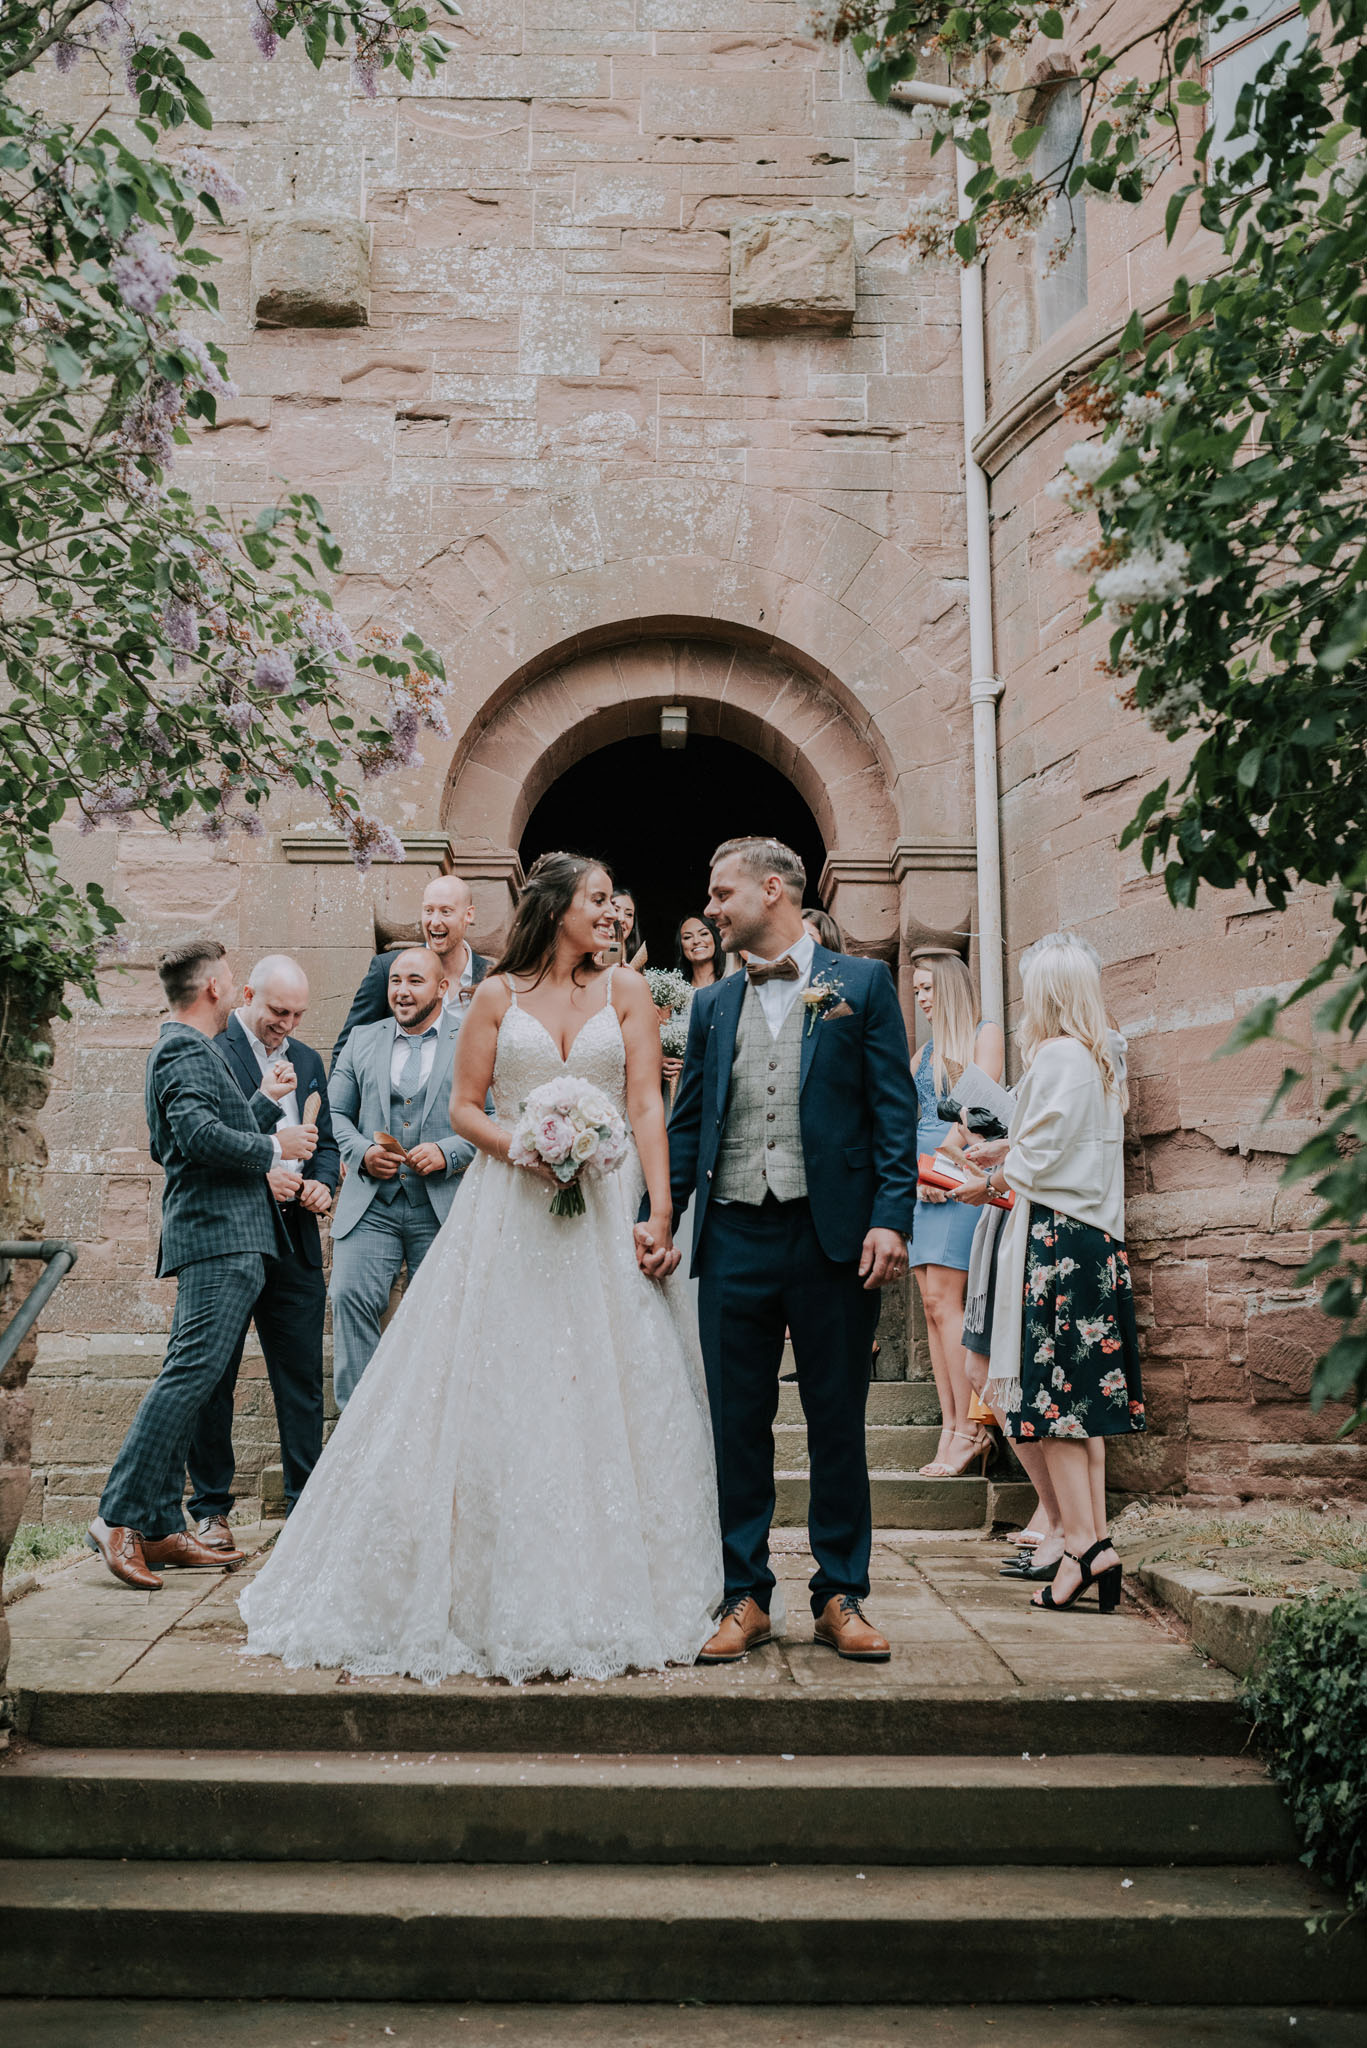 wedding-photographer-glewstone-court-hereford-scott-stockwell-photography266.jpg